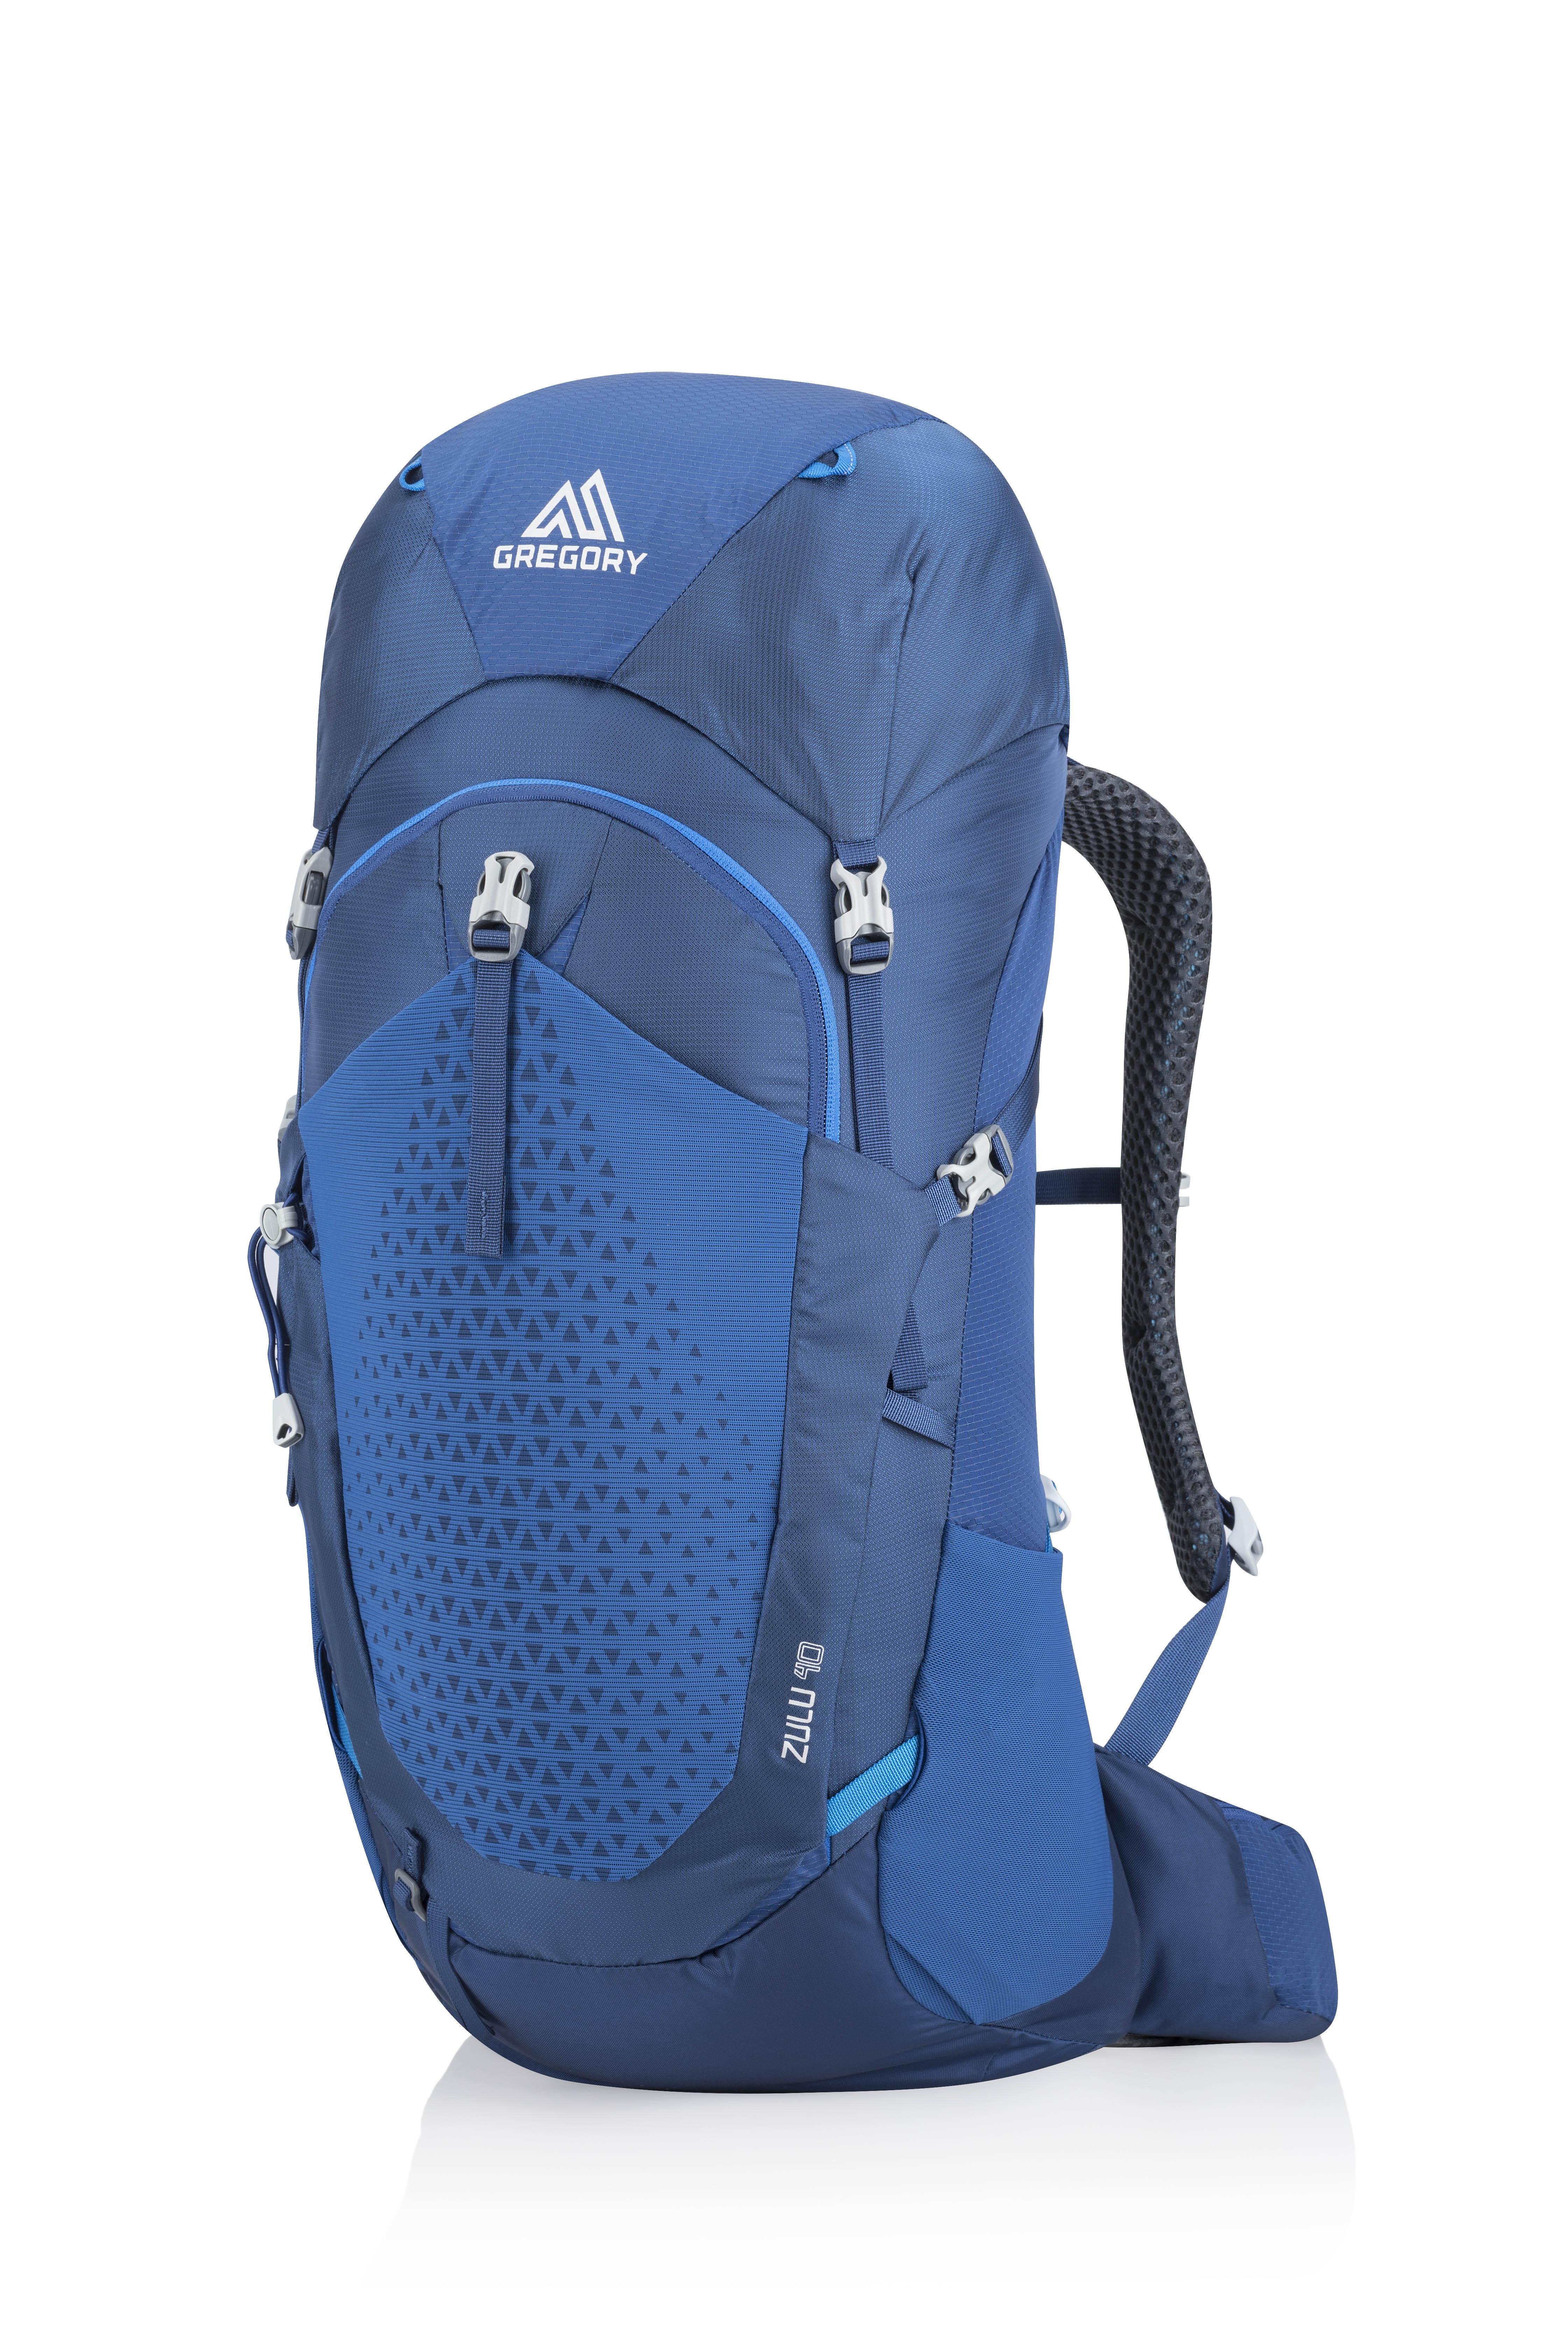 Gregory Zulu 40 - Hiking backpack - Men's